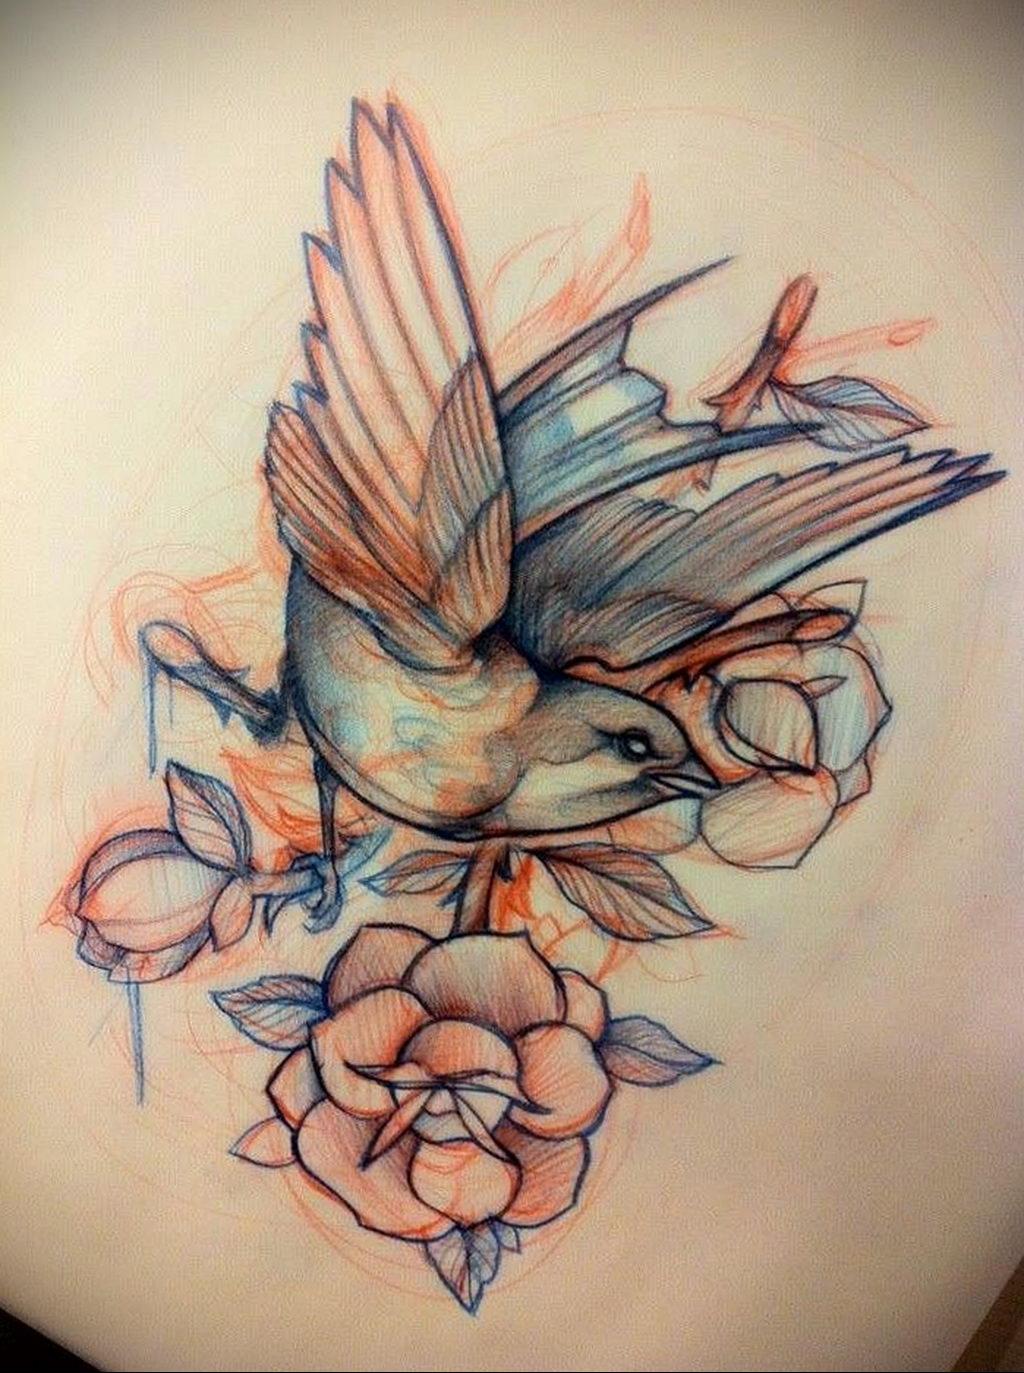 Фото тату про любовь рисунок Птица 03.02.2020 №034 -bird tattoo- tatufoto.com